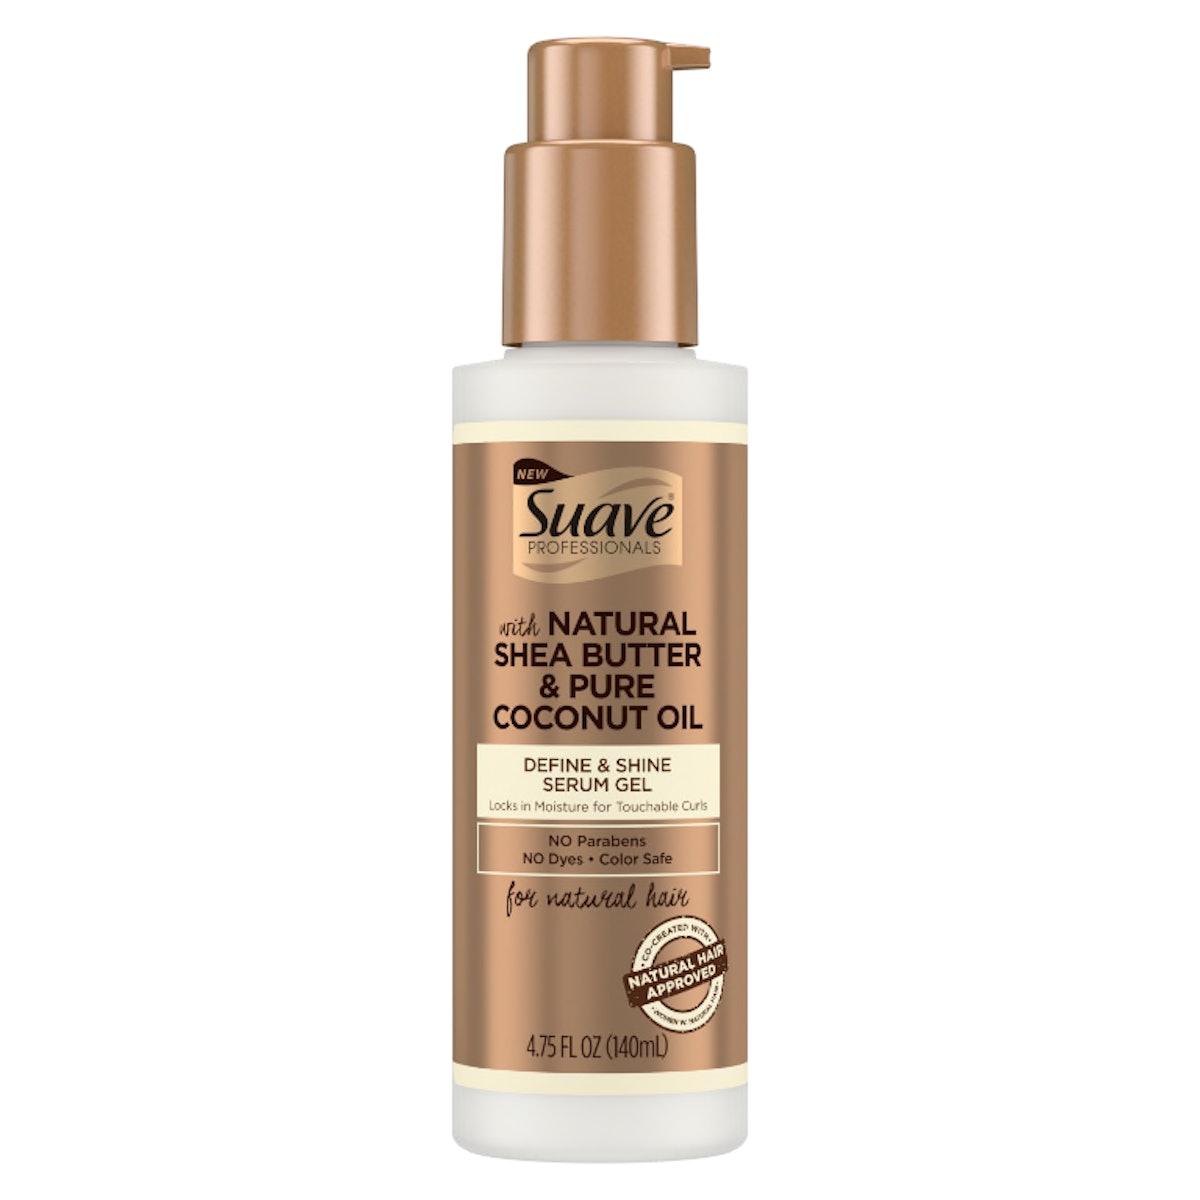 Suave Professionals for Natural Hair Define & Shine Gel Serum